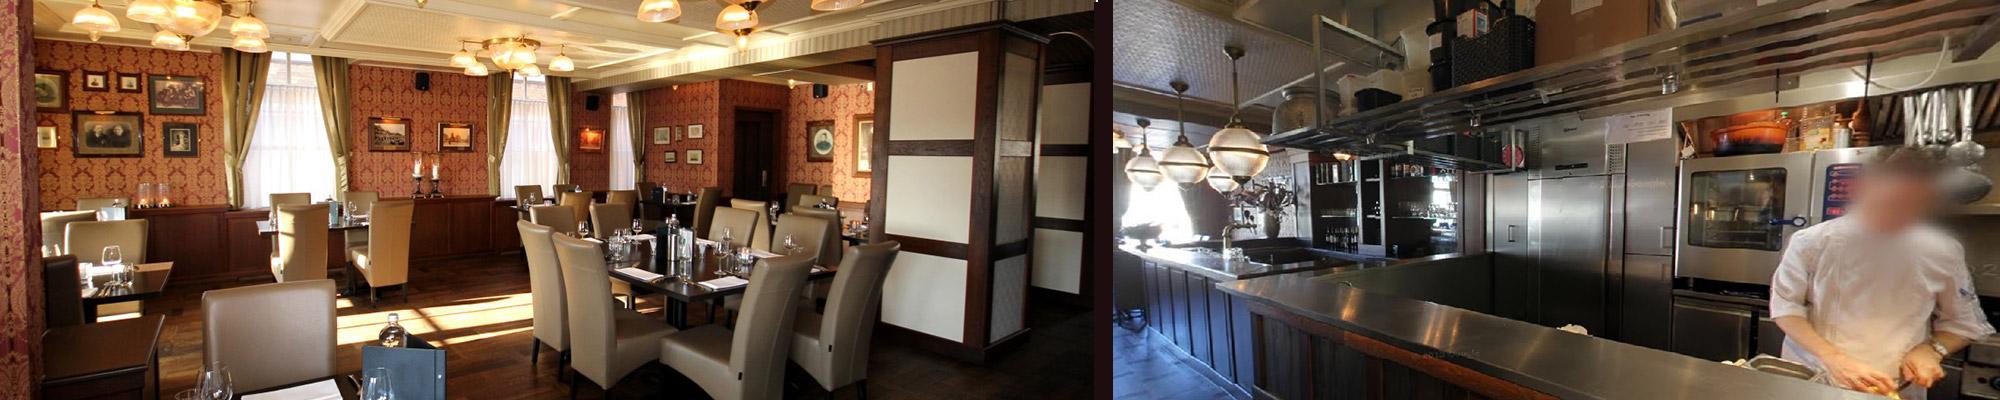 captain-cooks-roosendaal-restaurant